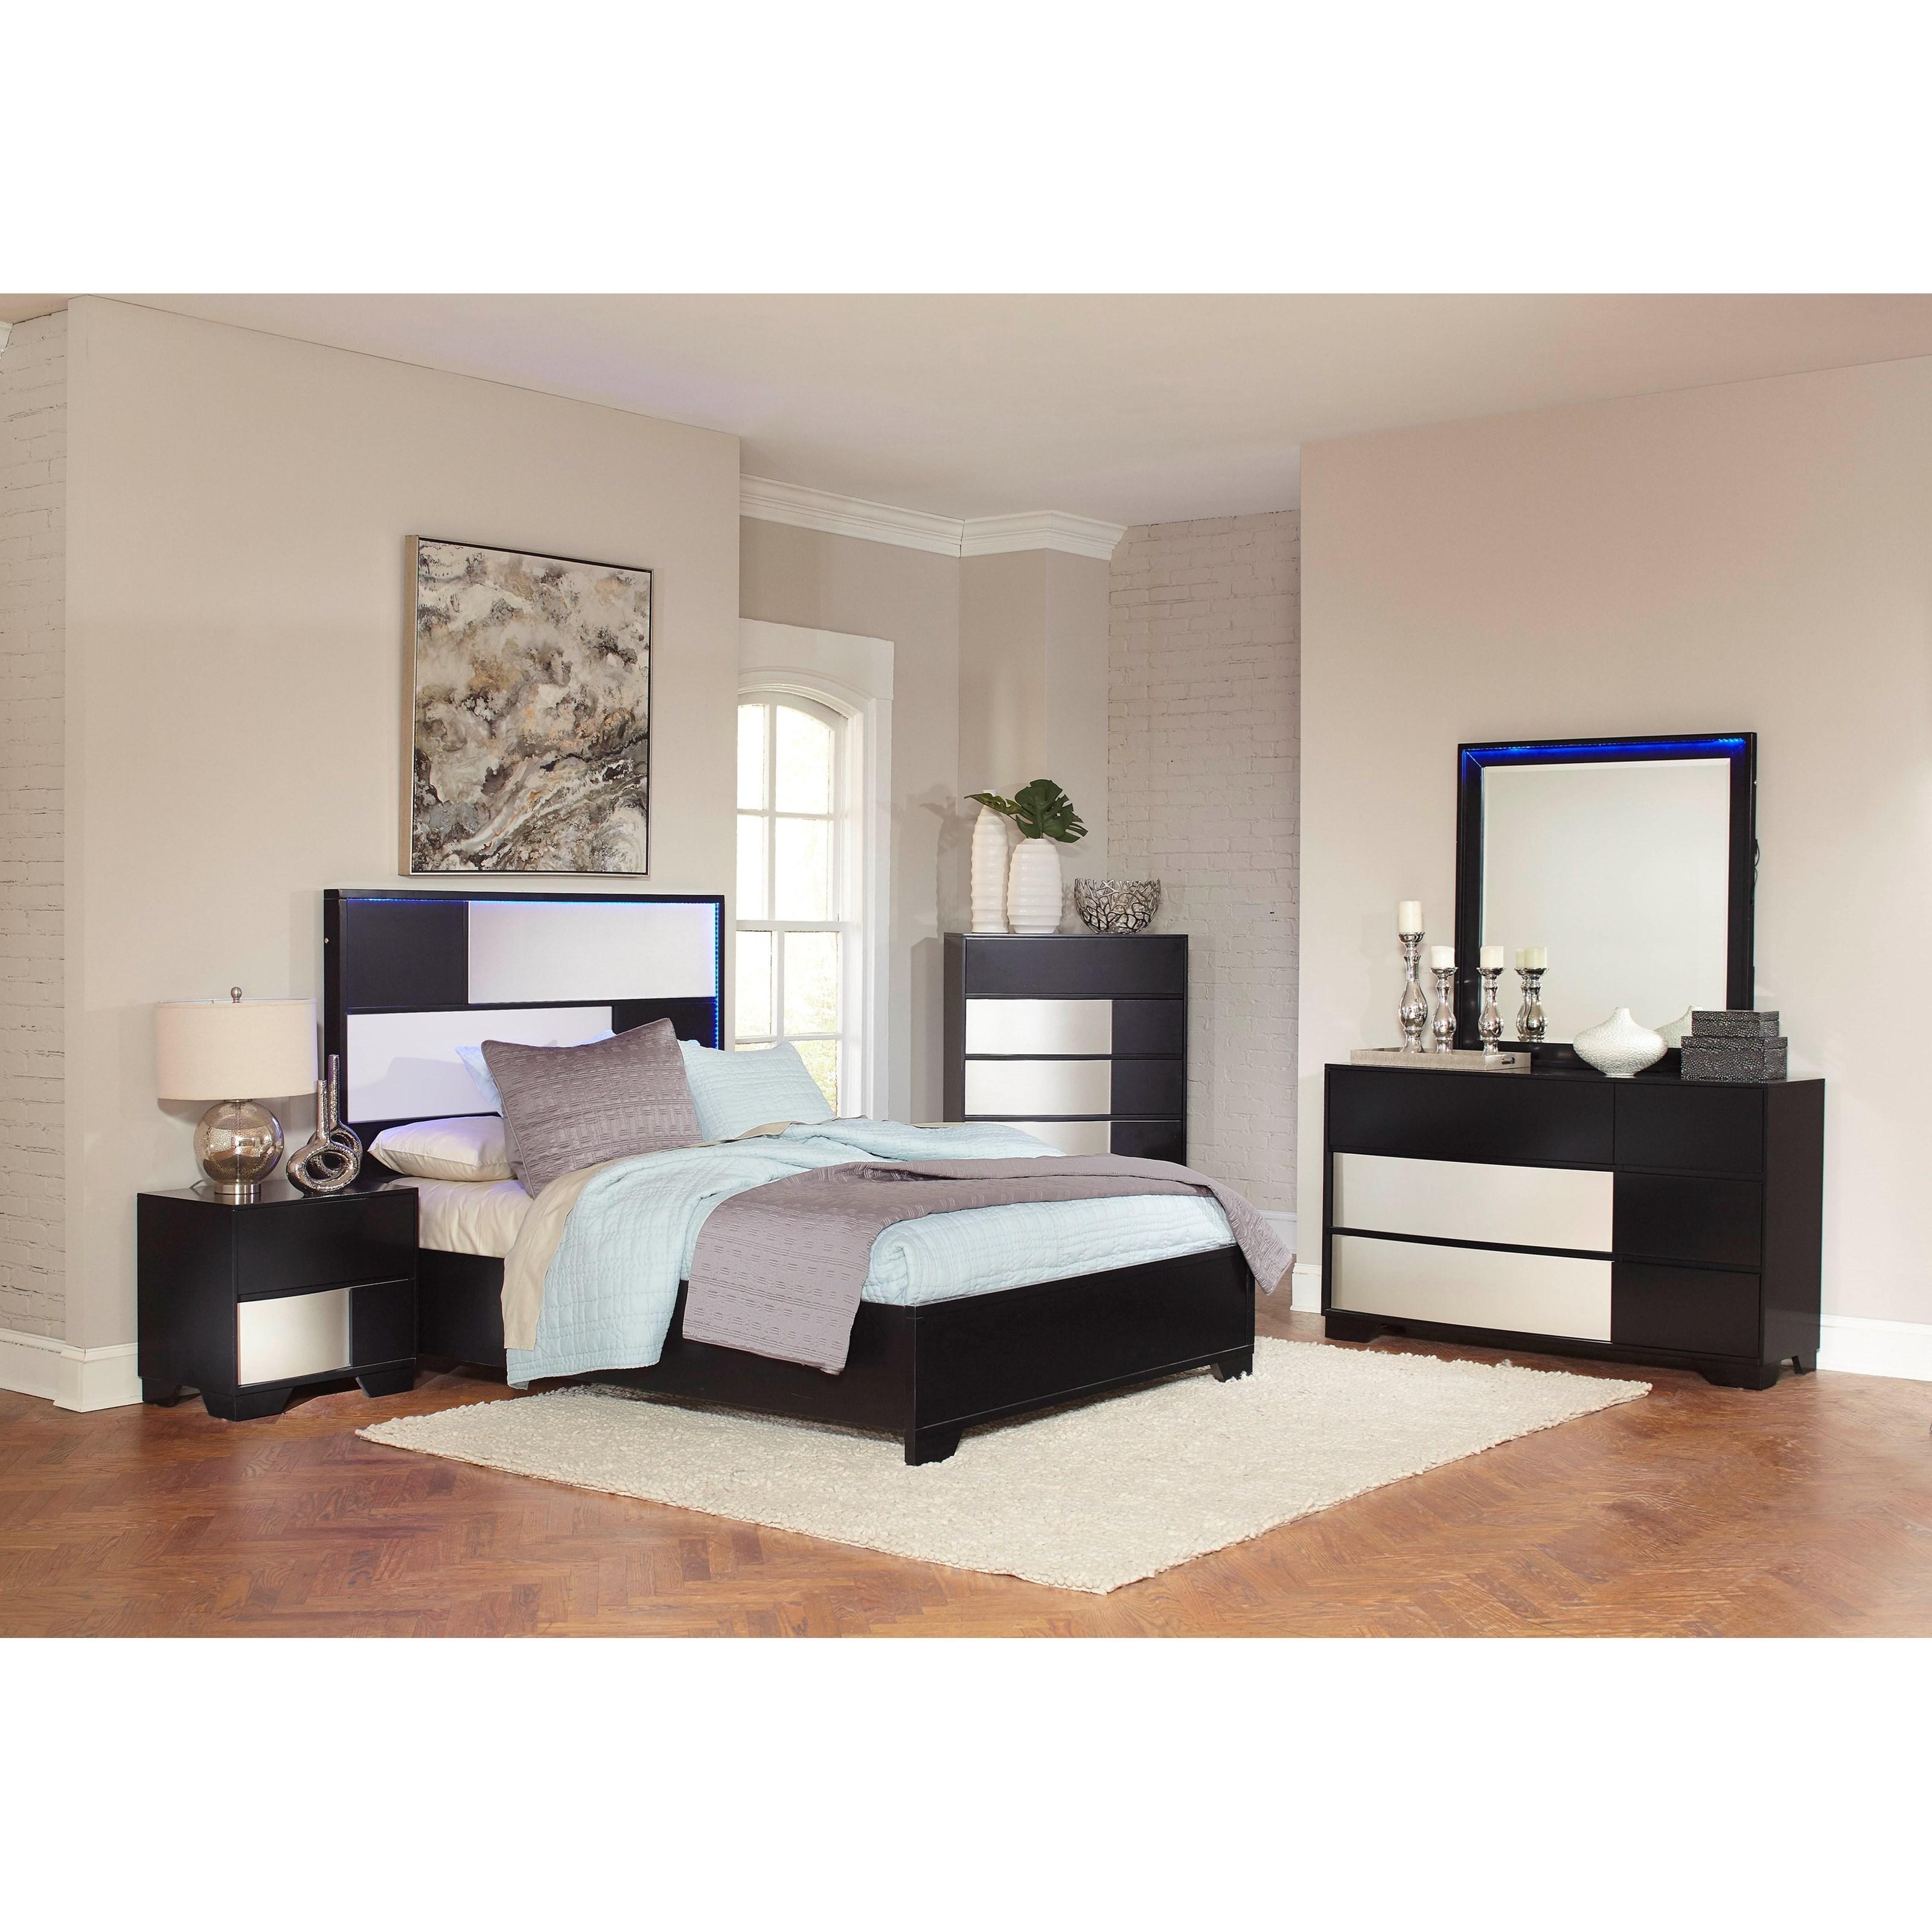 Coaster Havering California King Bedroom Group - Item Number: 20478 CK Bedroom Group 1